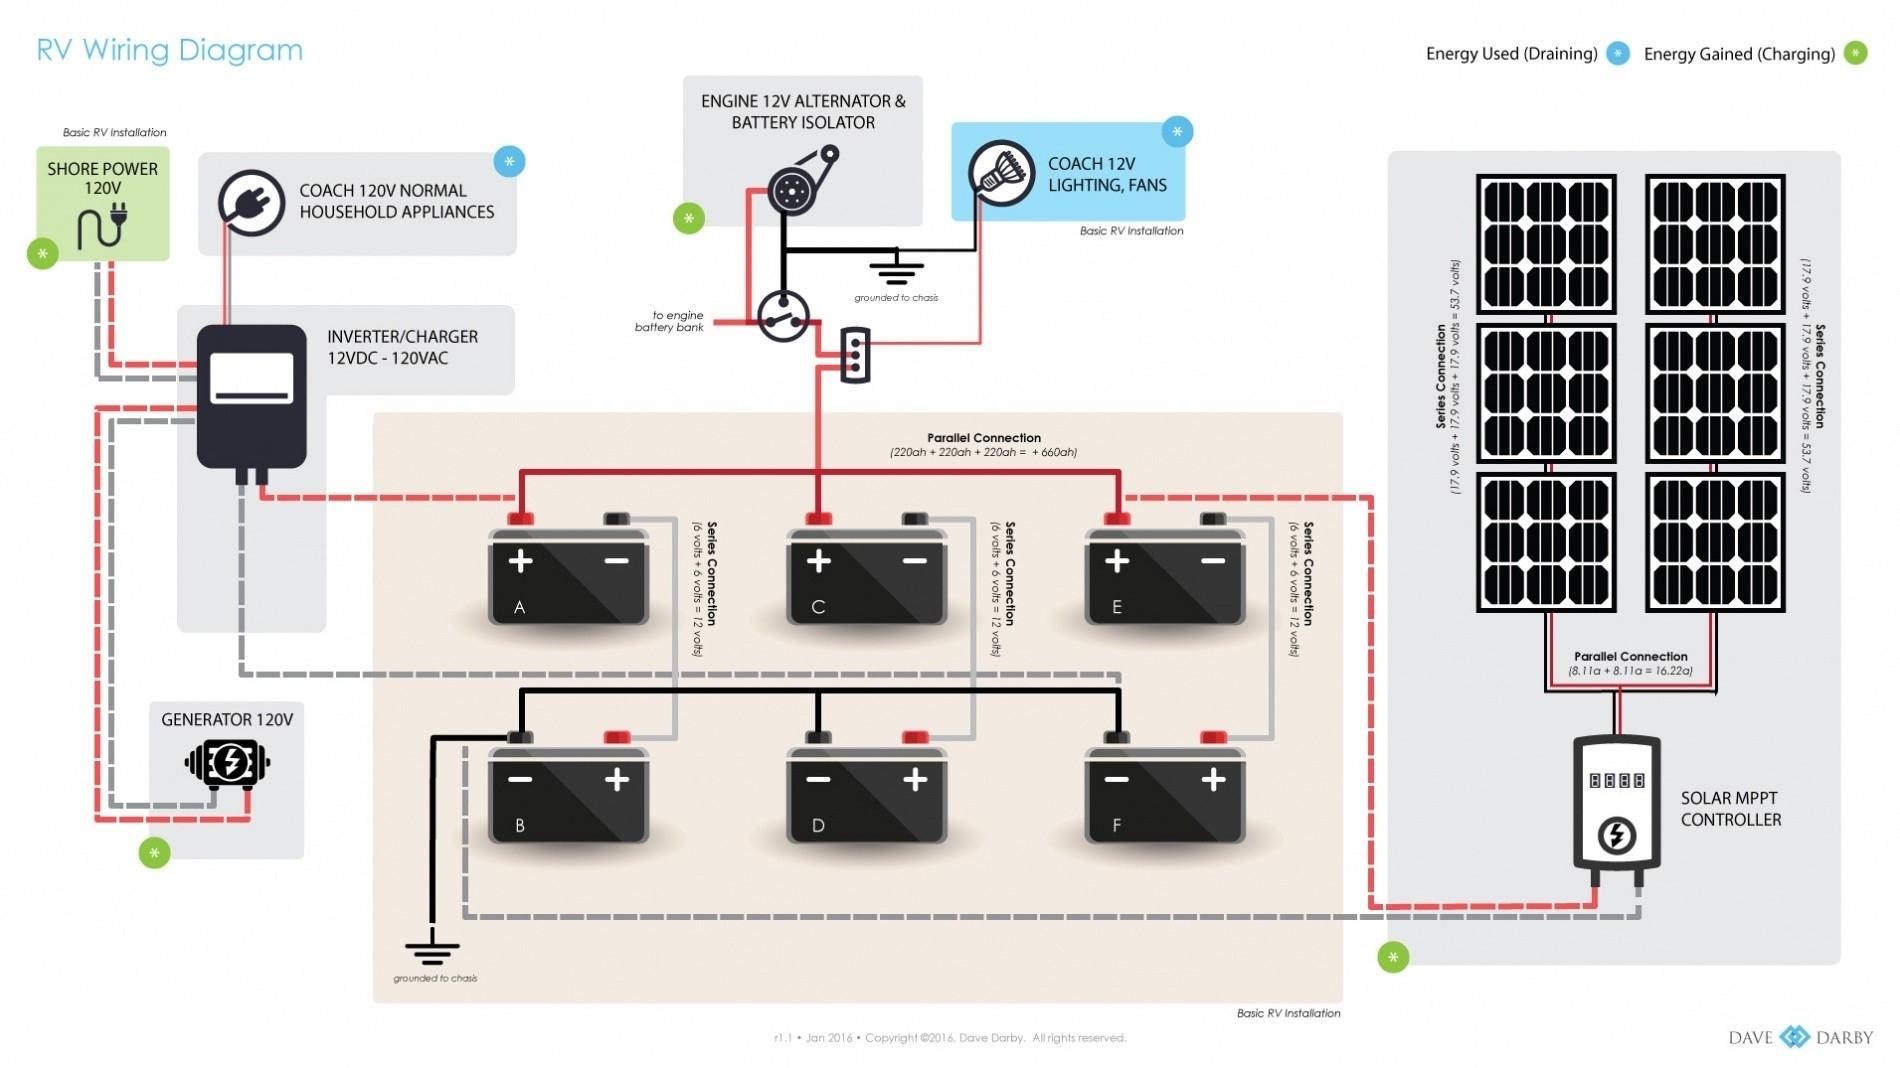 rv solar panel installation wiring diagram Download-Solar Panel Wiring Diagram Example Fresh Wiring Diagram for F Grid solar System Fresh Wiring Diagram 10-s